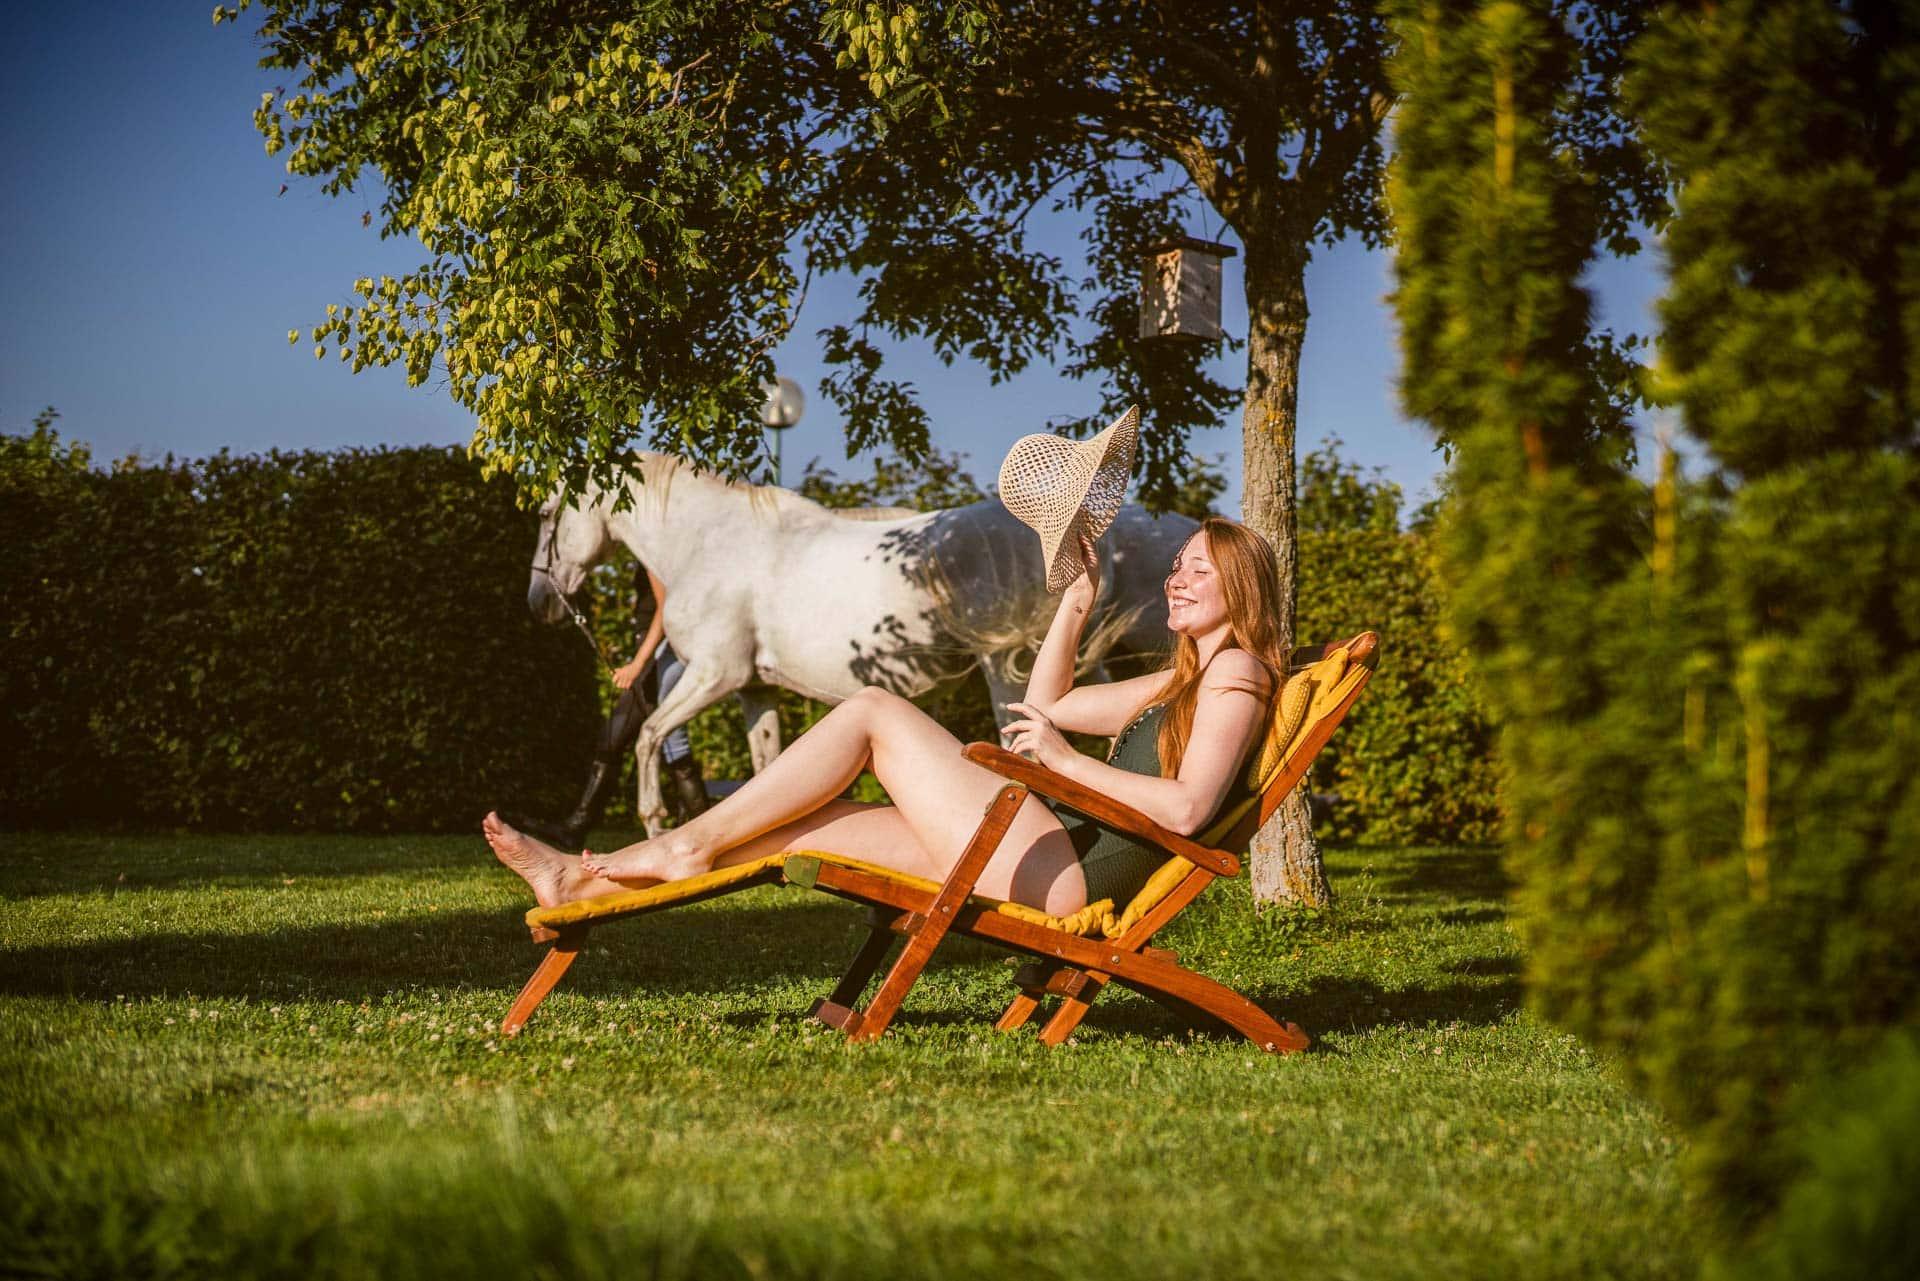 Frau sonnt sich im Liegestuhl